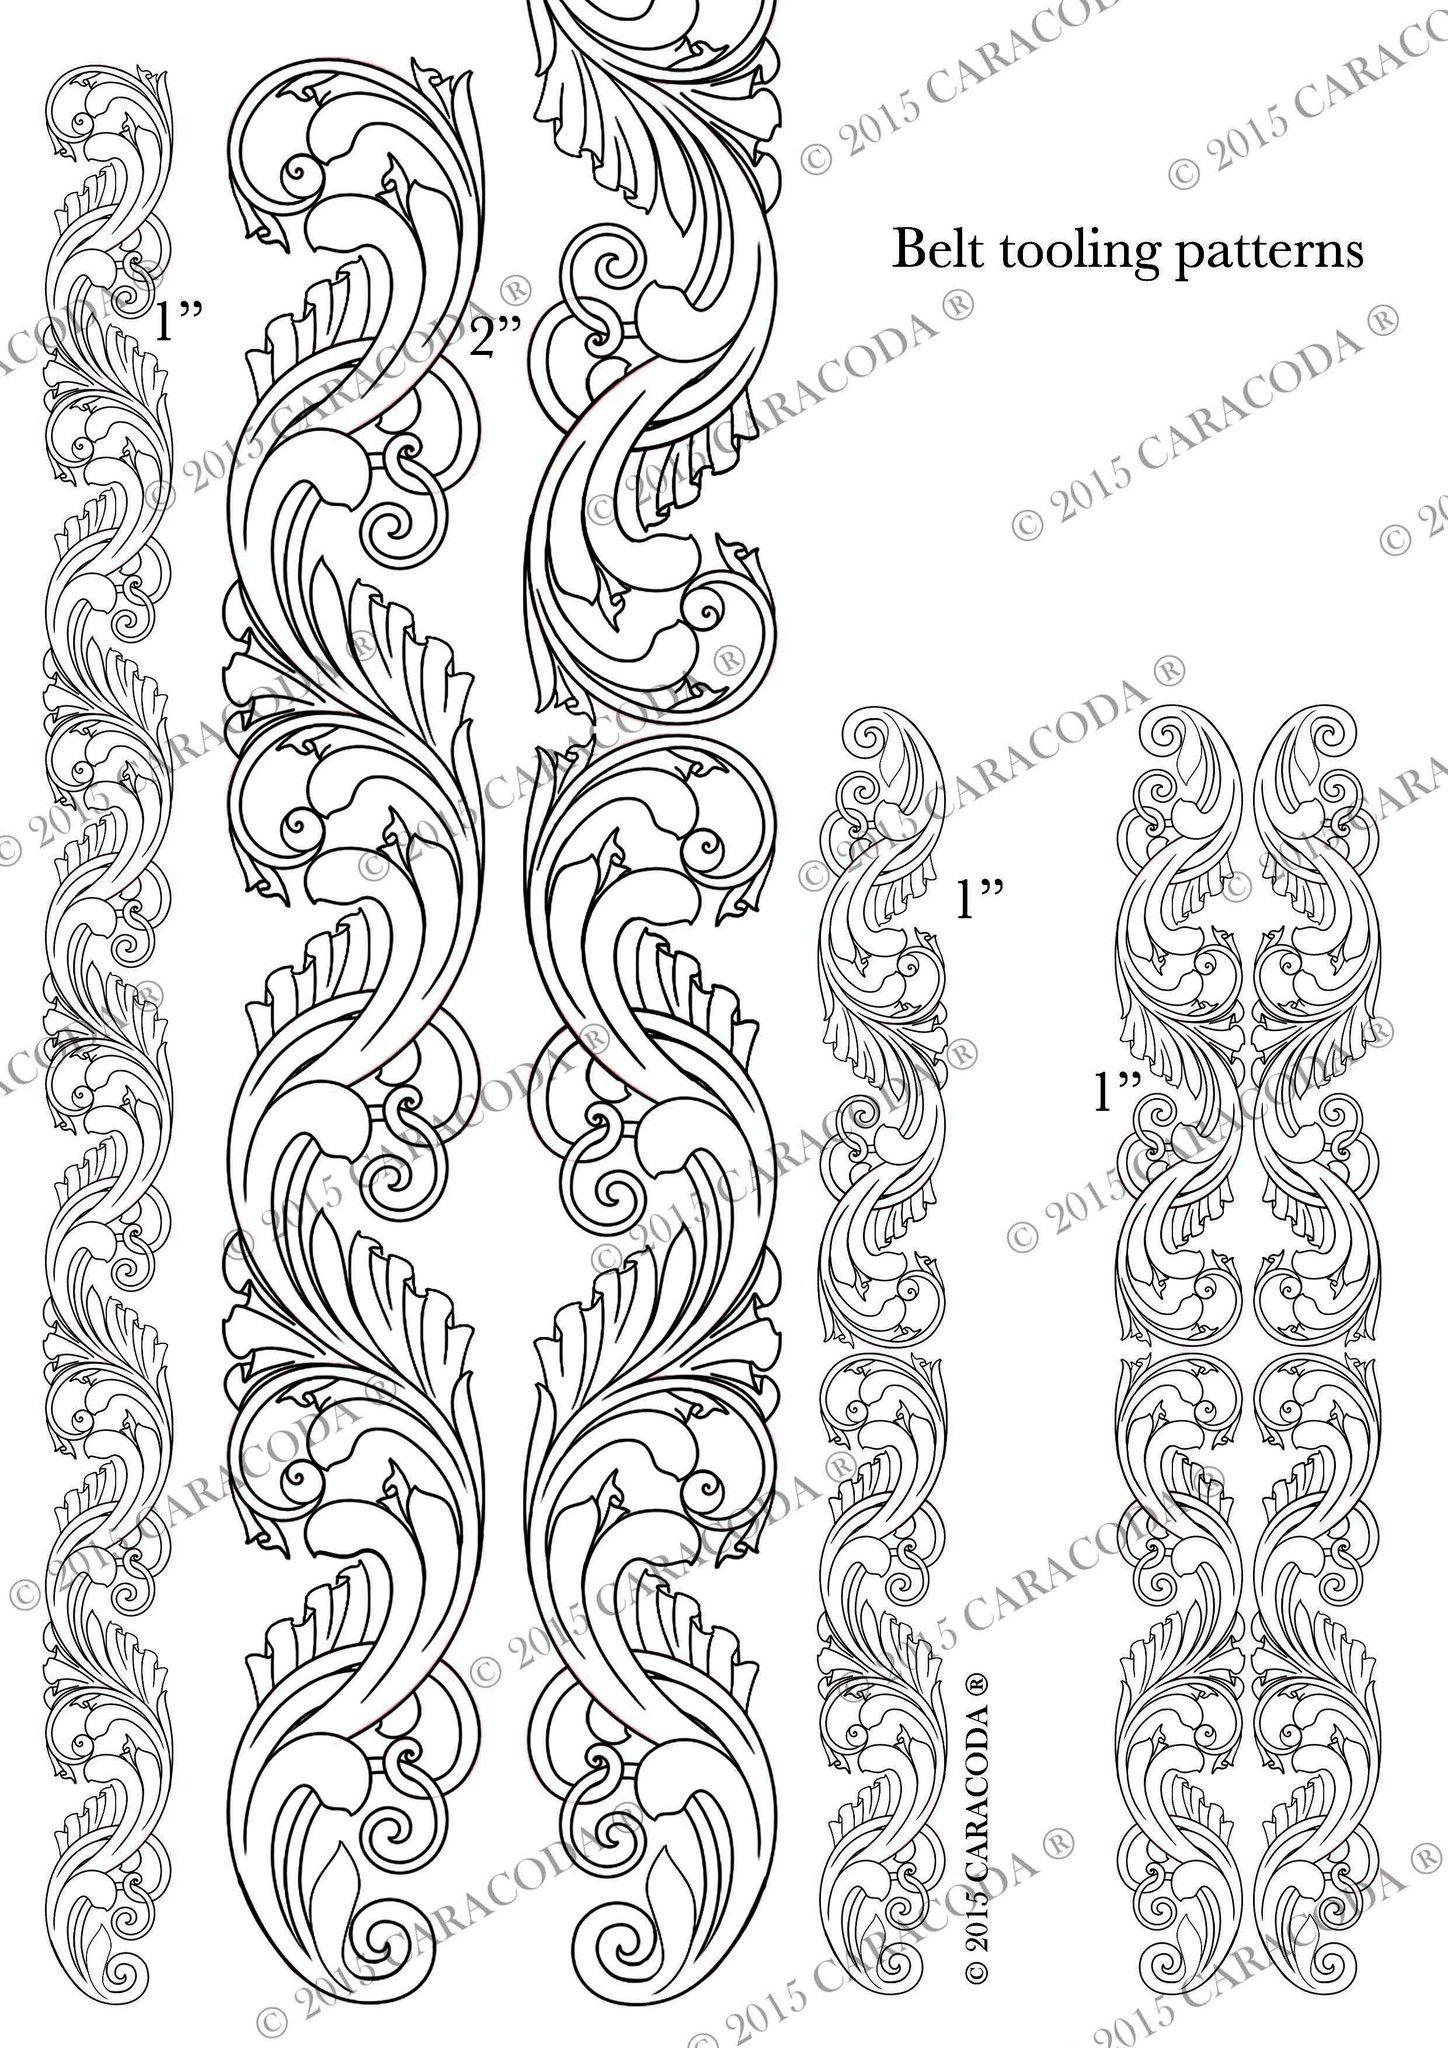 Leathercraft Tooling Pattern Belt A4 001   Leather Patterns - Free Printable Leather Belt Tooling Patterns